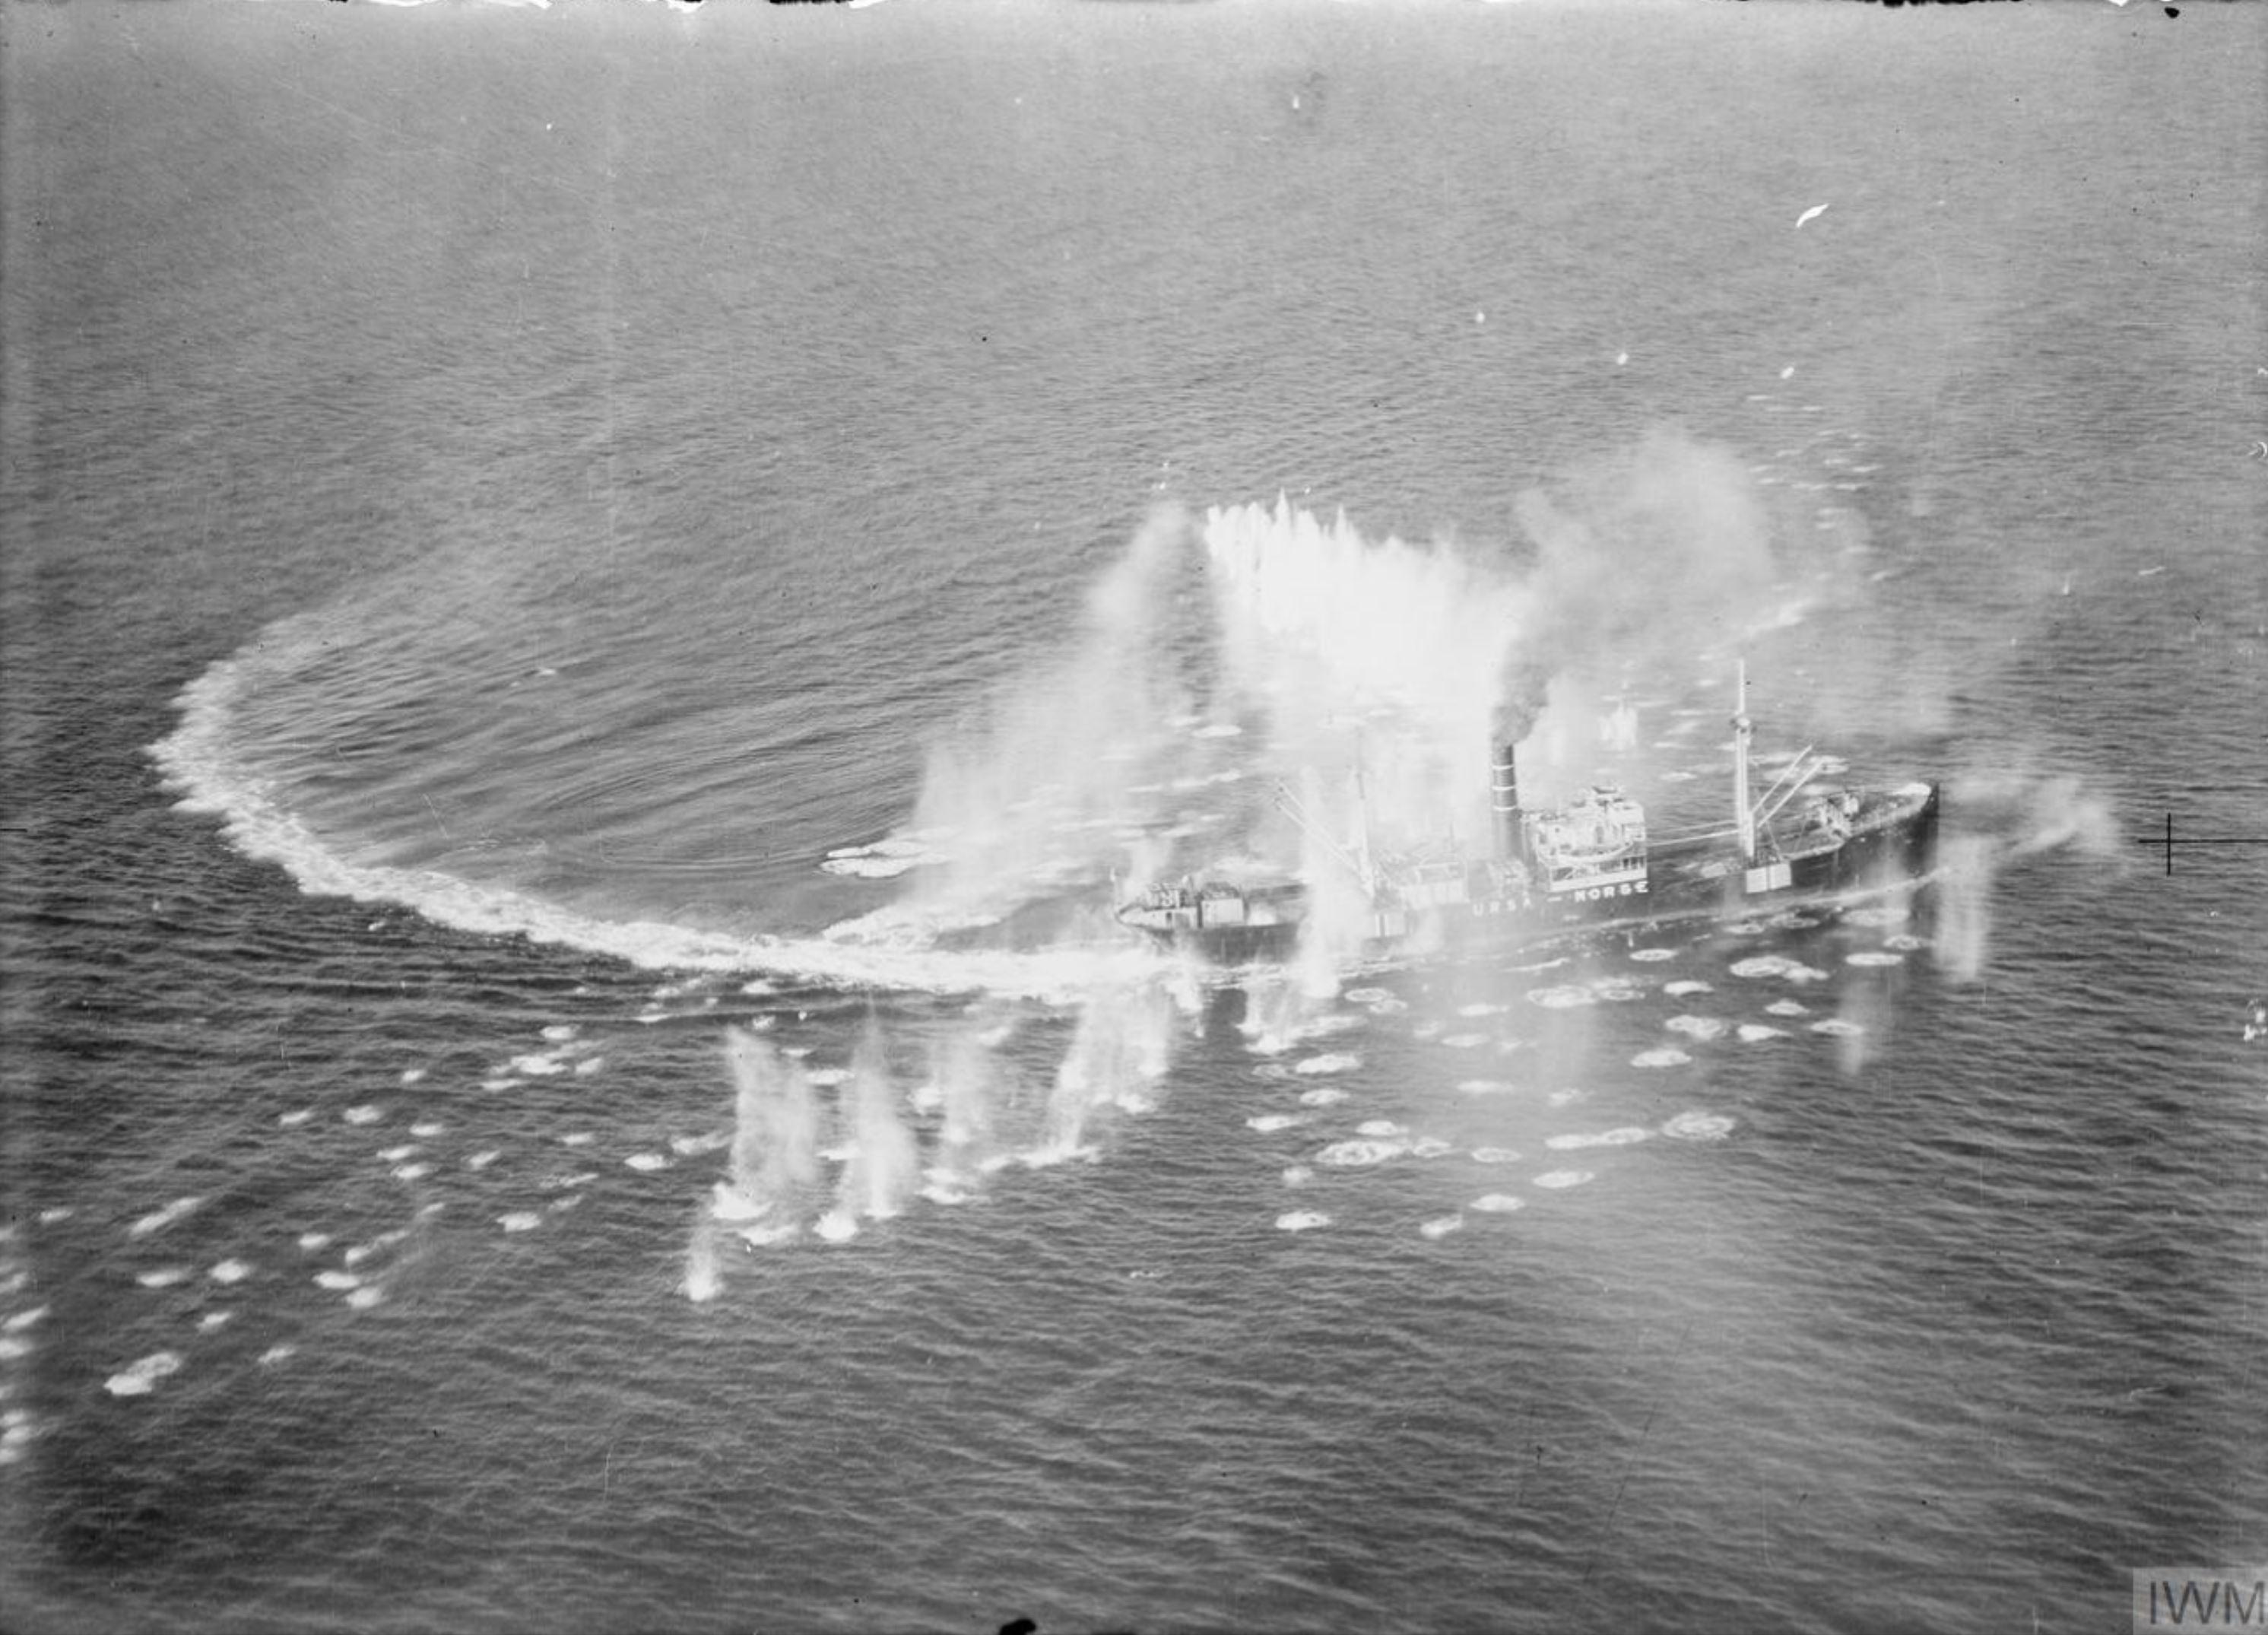 Banff Strike Wing n RAF 144Sqn attack Norwegian DS URSA which avoids being sunk 19th Sep 1944 IWM C4835